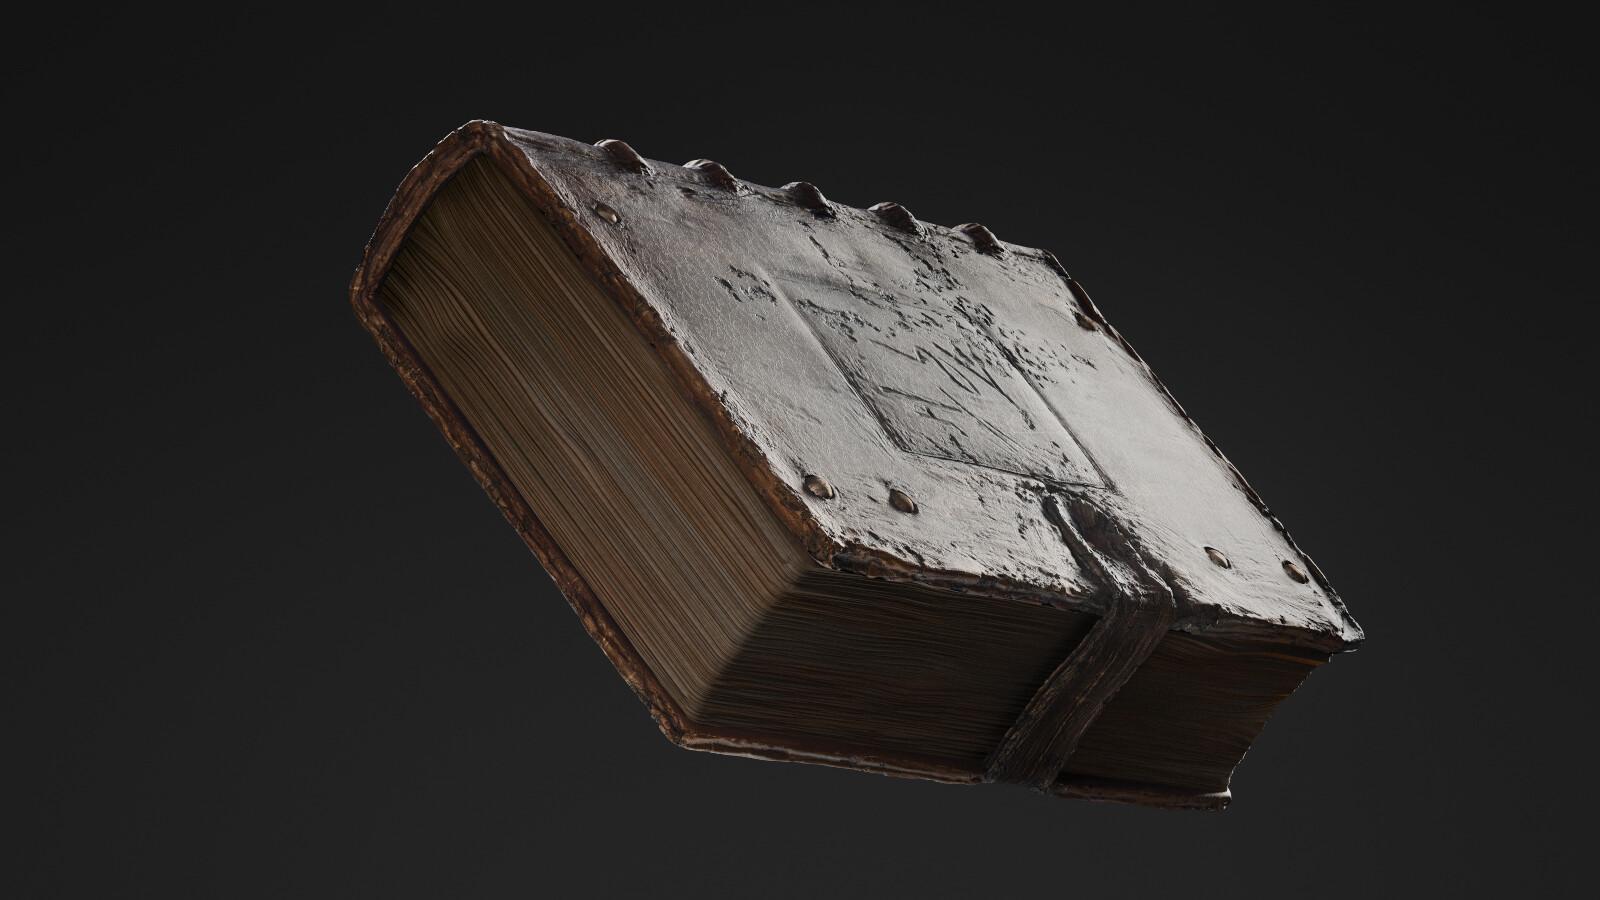 Generic old book